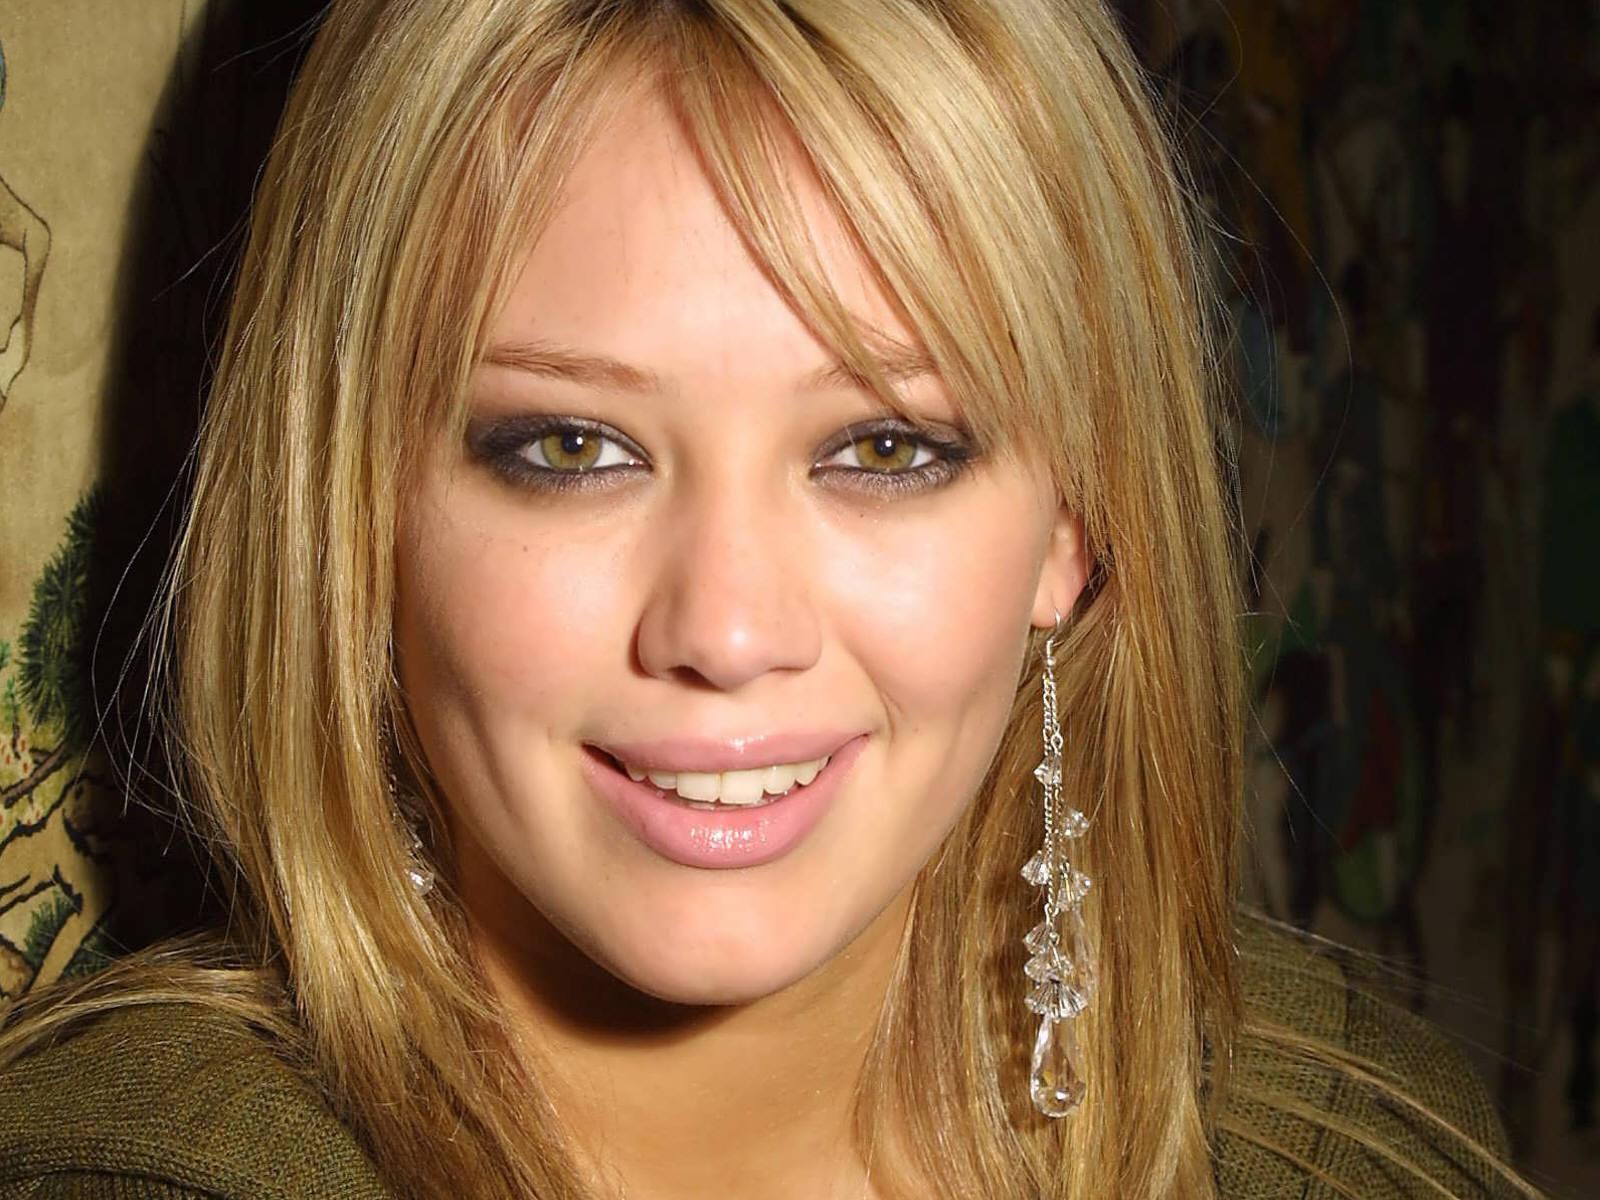 http://2.bp.blogspot.com/_Q_MQFtopsfY/SN87-Ic0doI/AAAAAAAAImk/8ebxQxgtUl8/s1600/Fullwalls.blogspot.com_Hilary_Duff_213.jpg